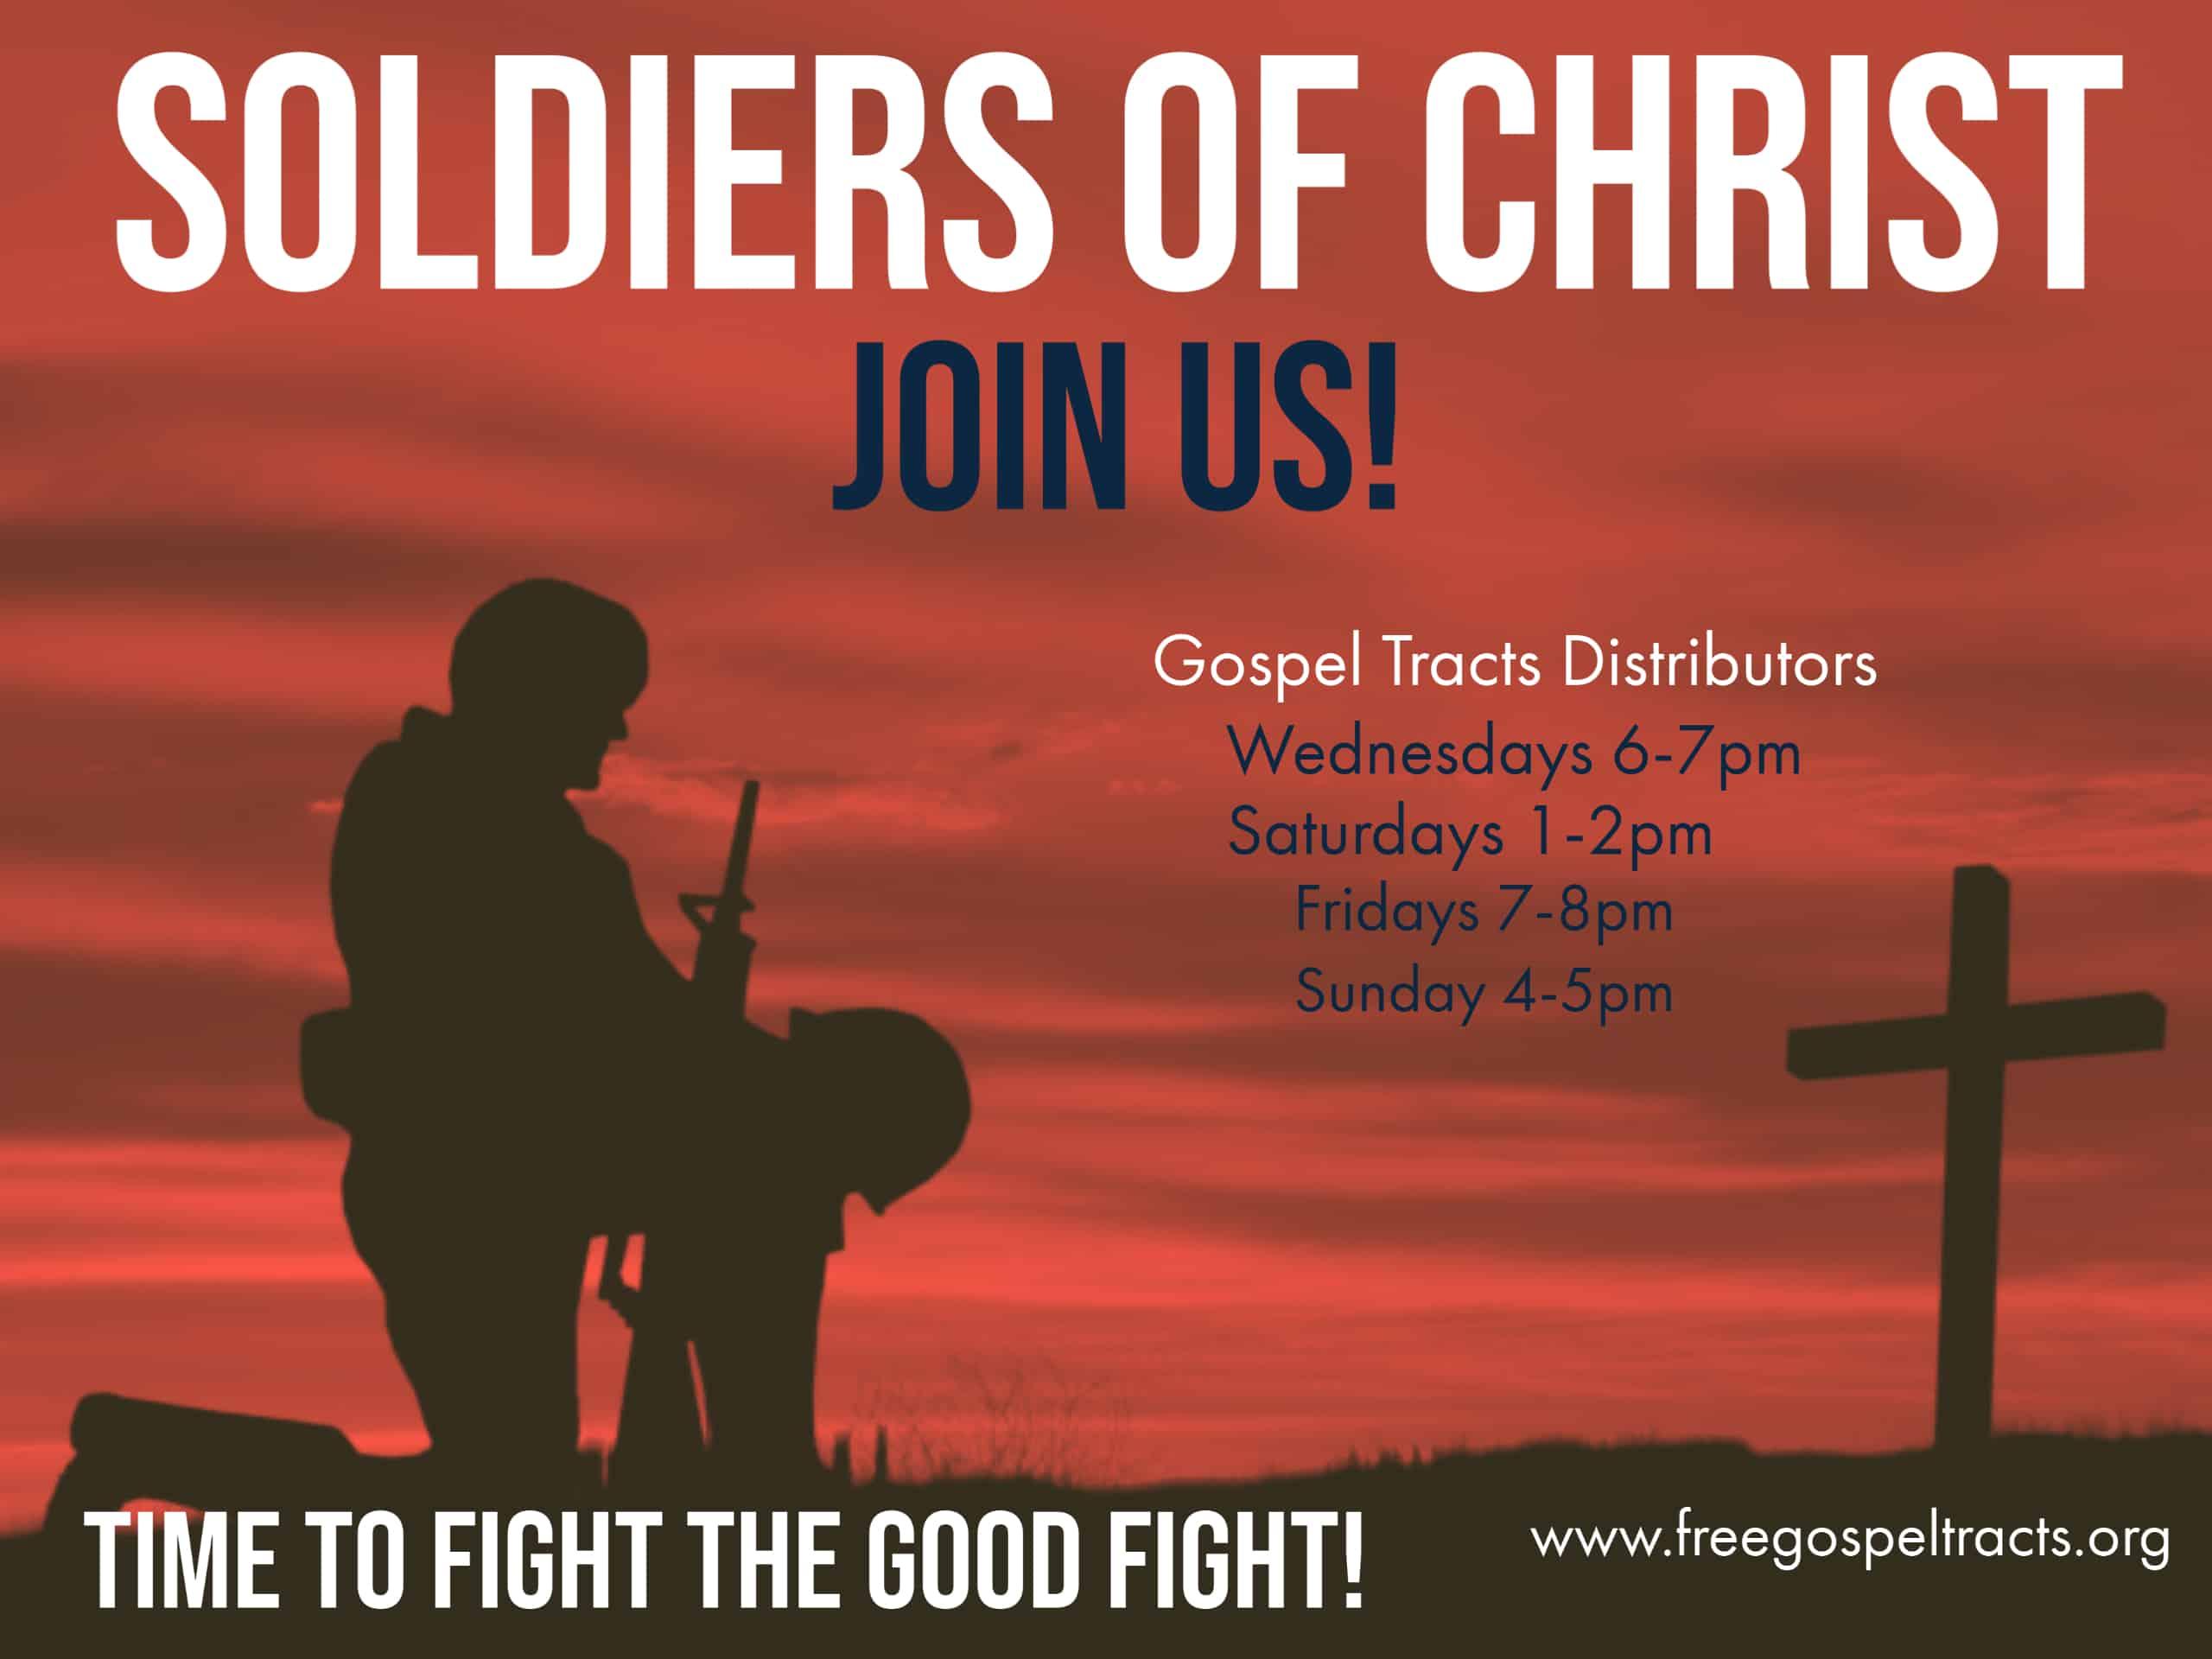 Gospel Tracts Distributors, soul winning